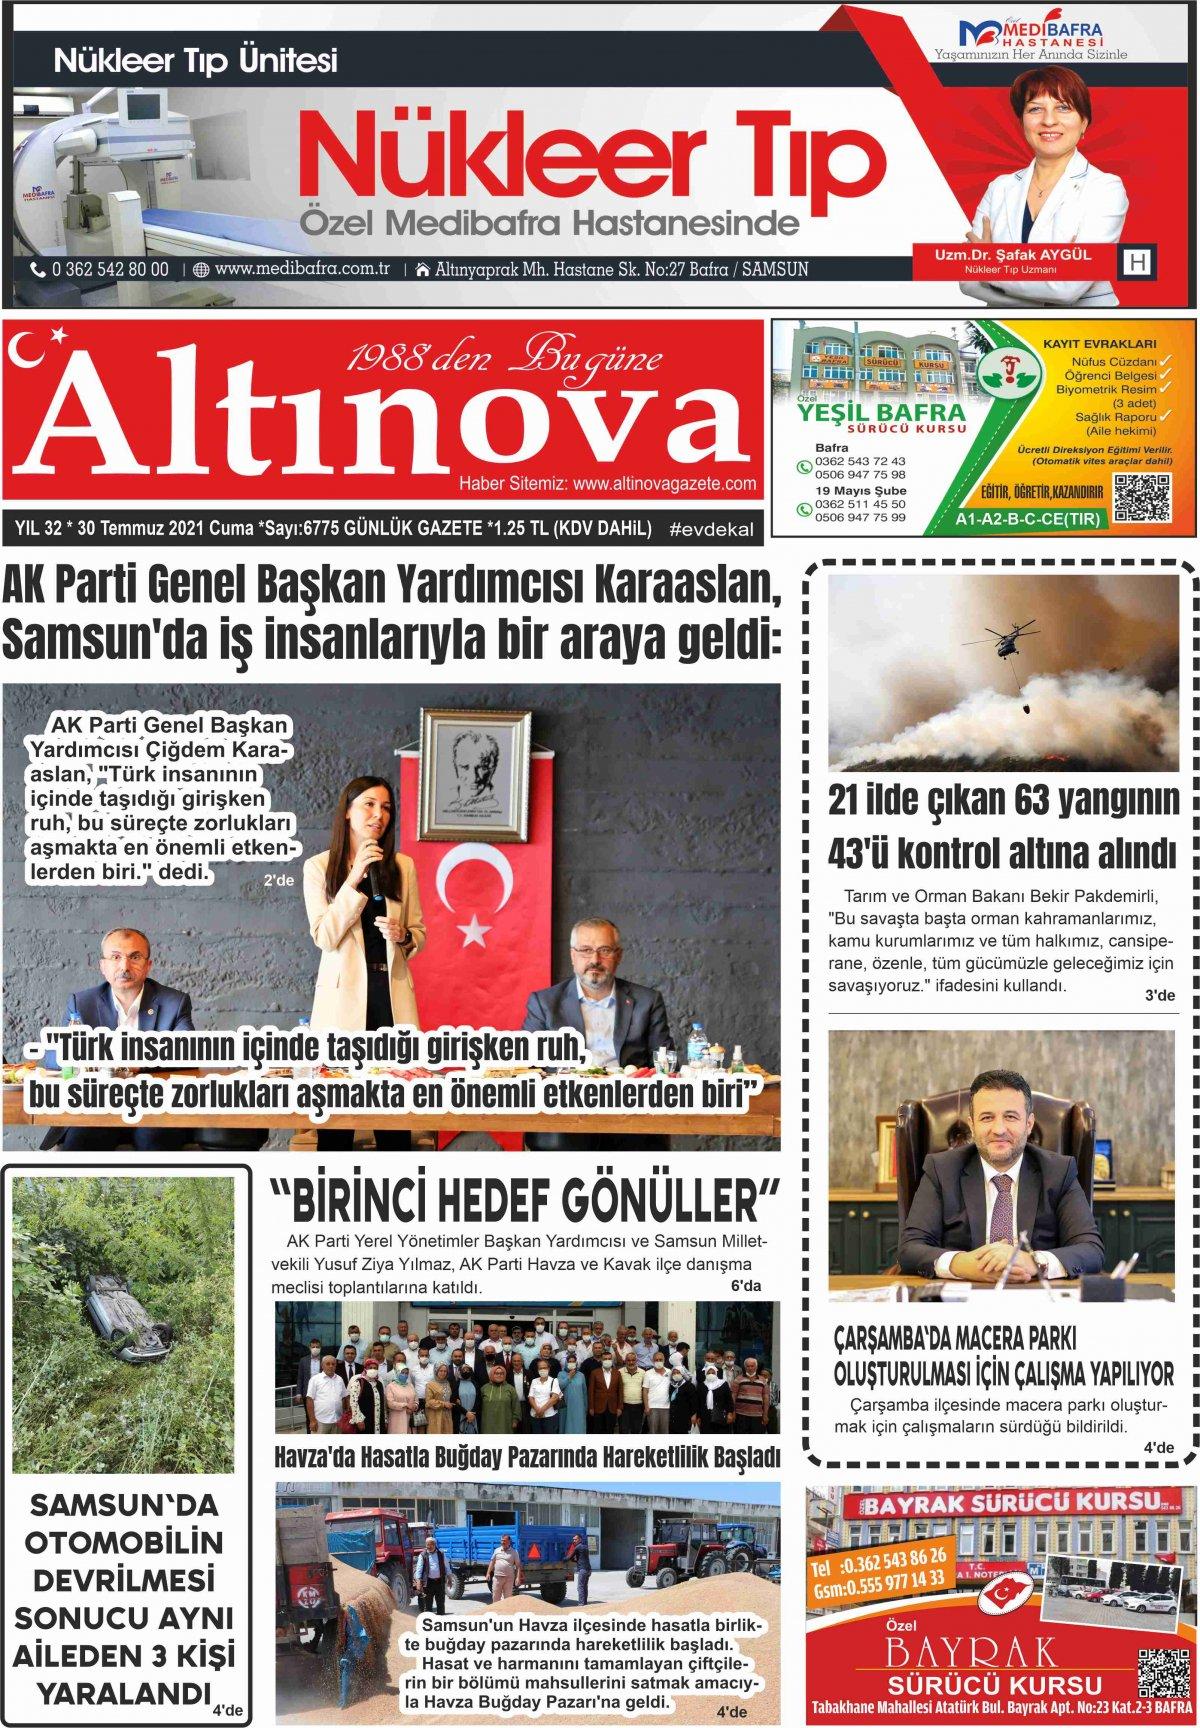 Bafra Haber, Bafrahaber, Bafra Haberleri, altinovagazete.com - 30.07.2021 Manşeti